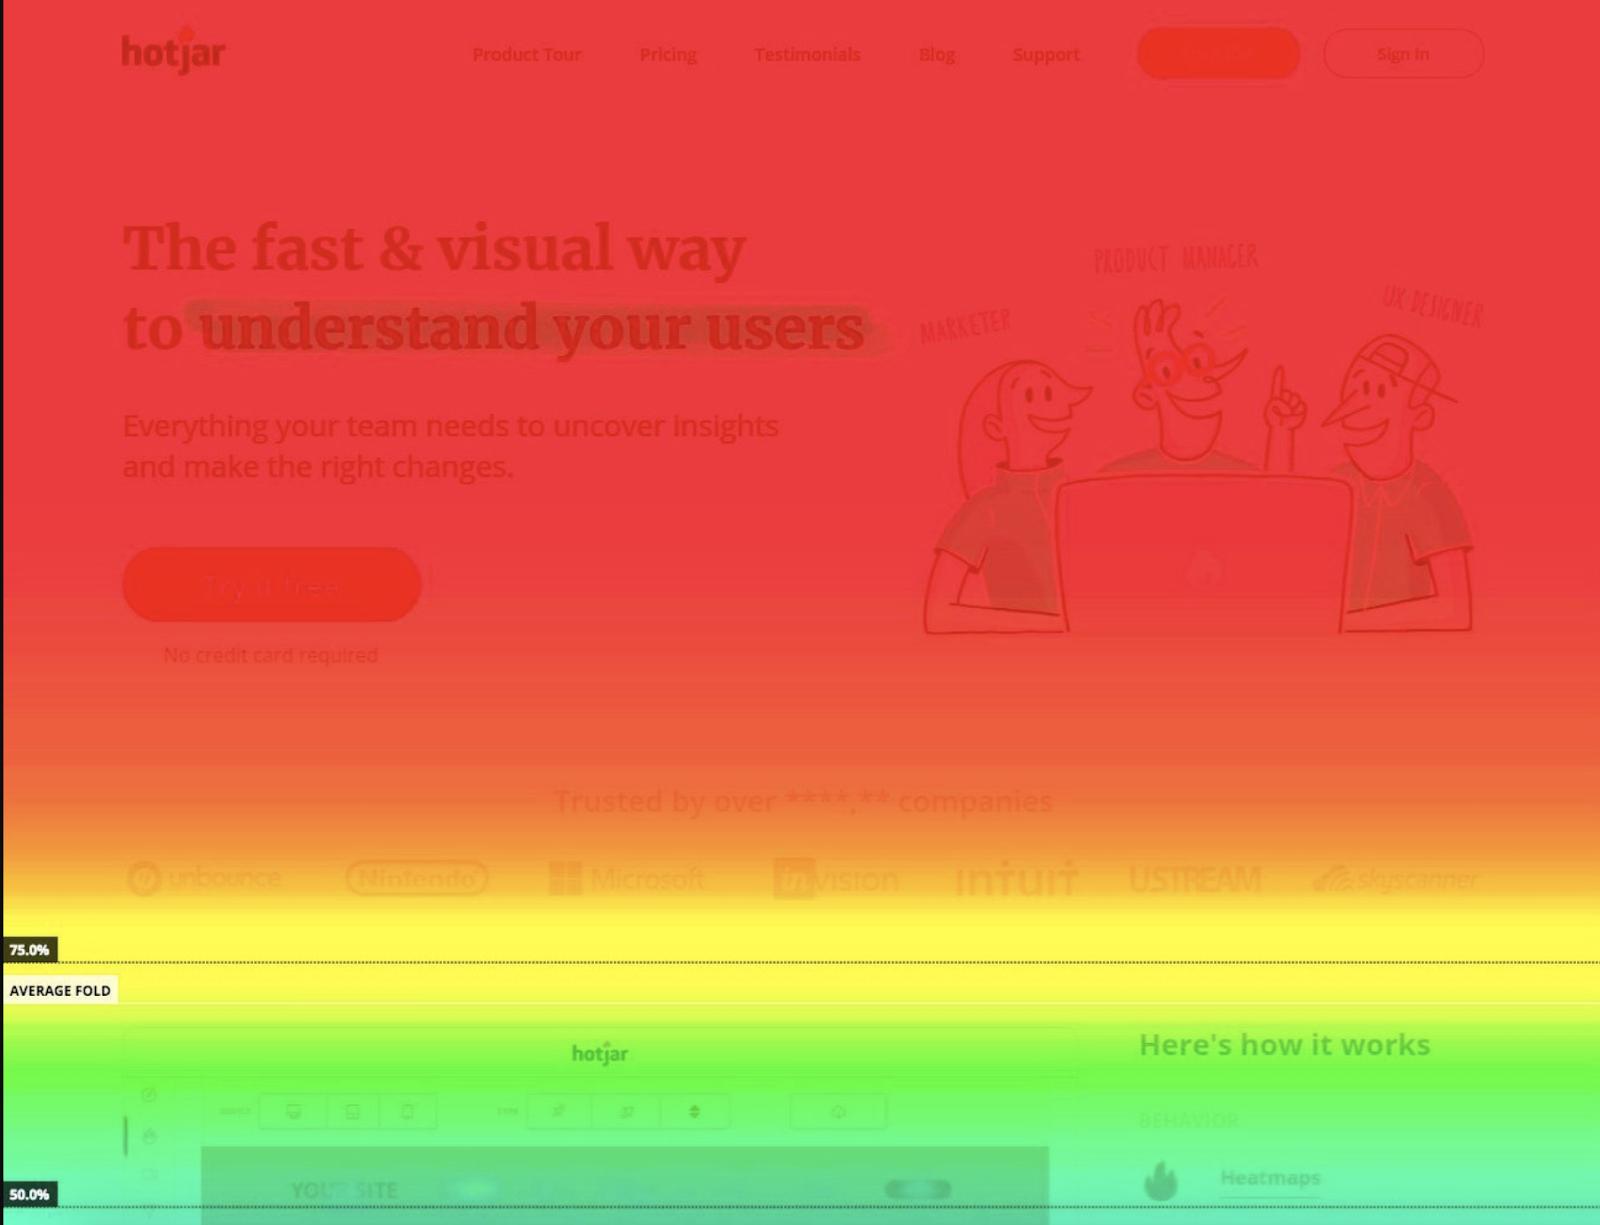 Hotjar scroll map's demonstration